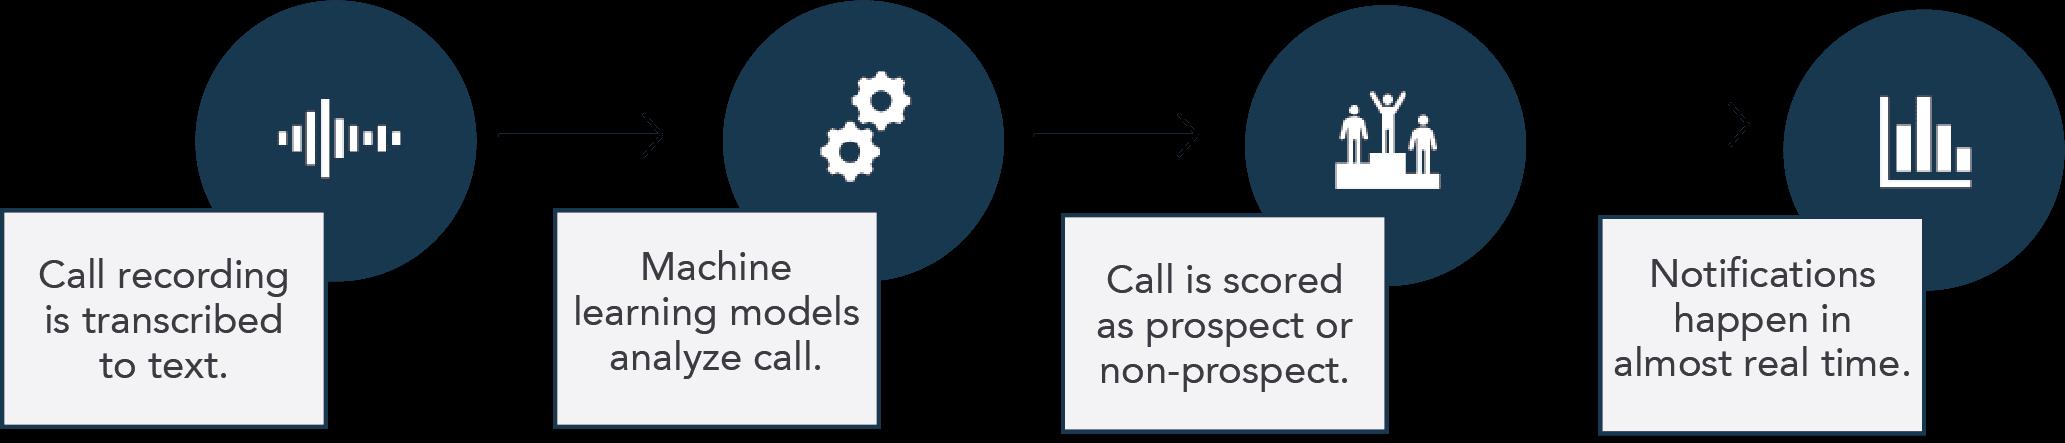 LeadScore-AI-Diagram